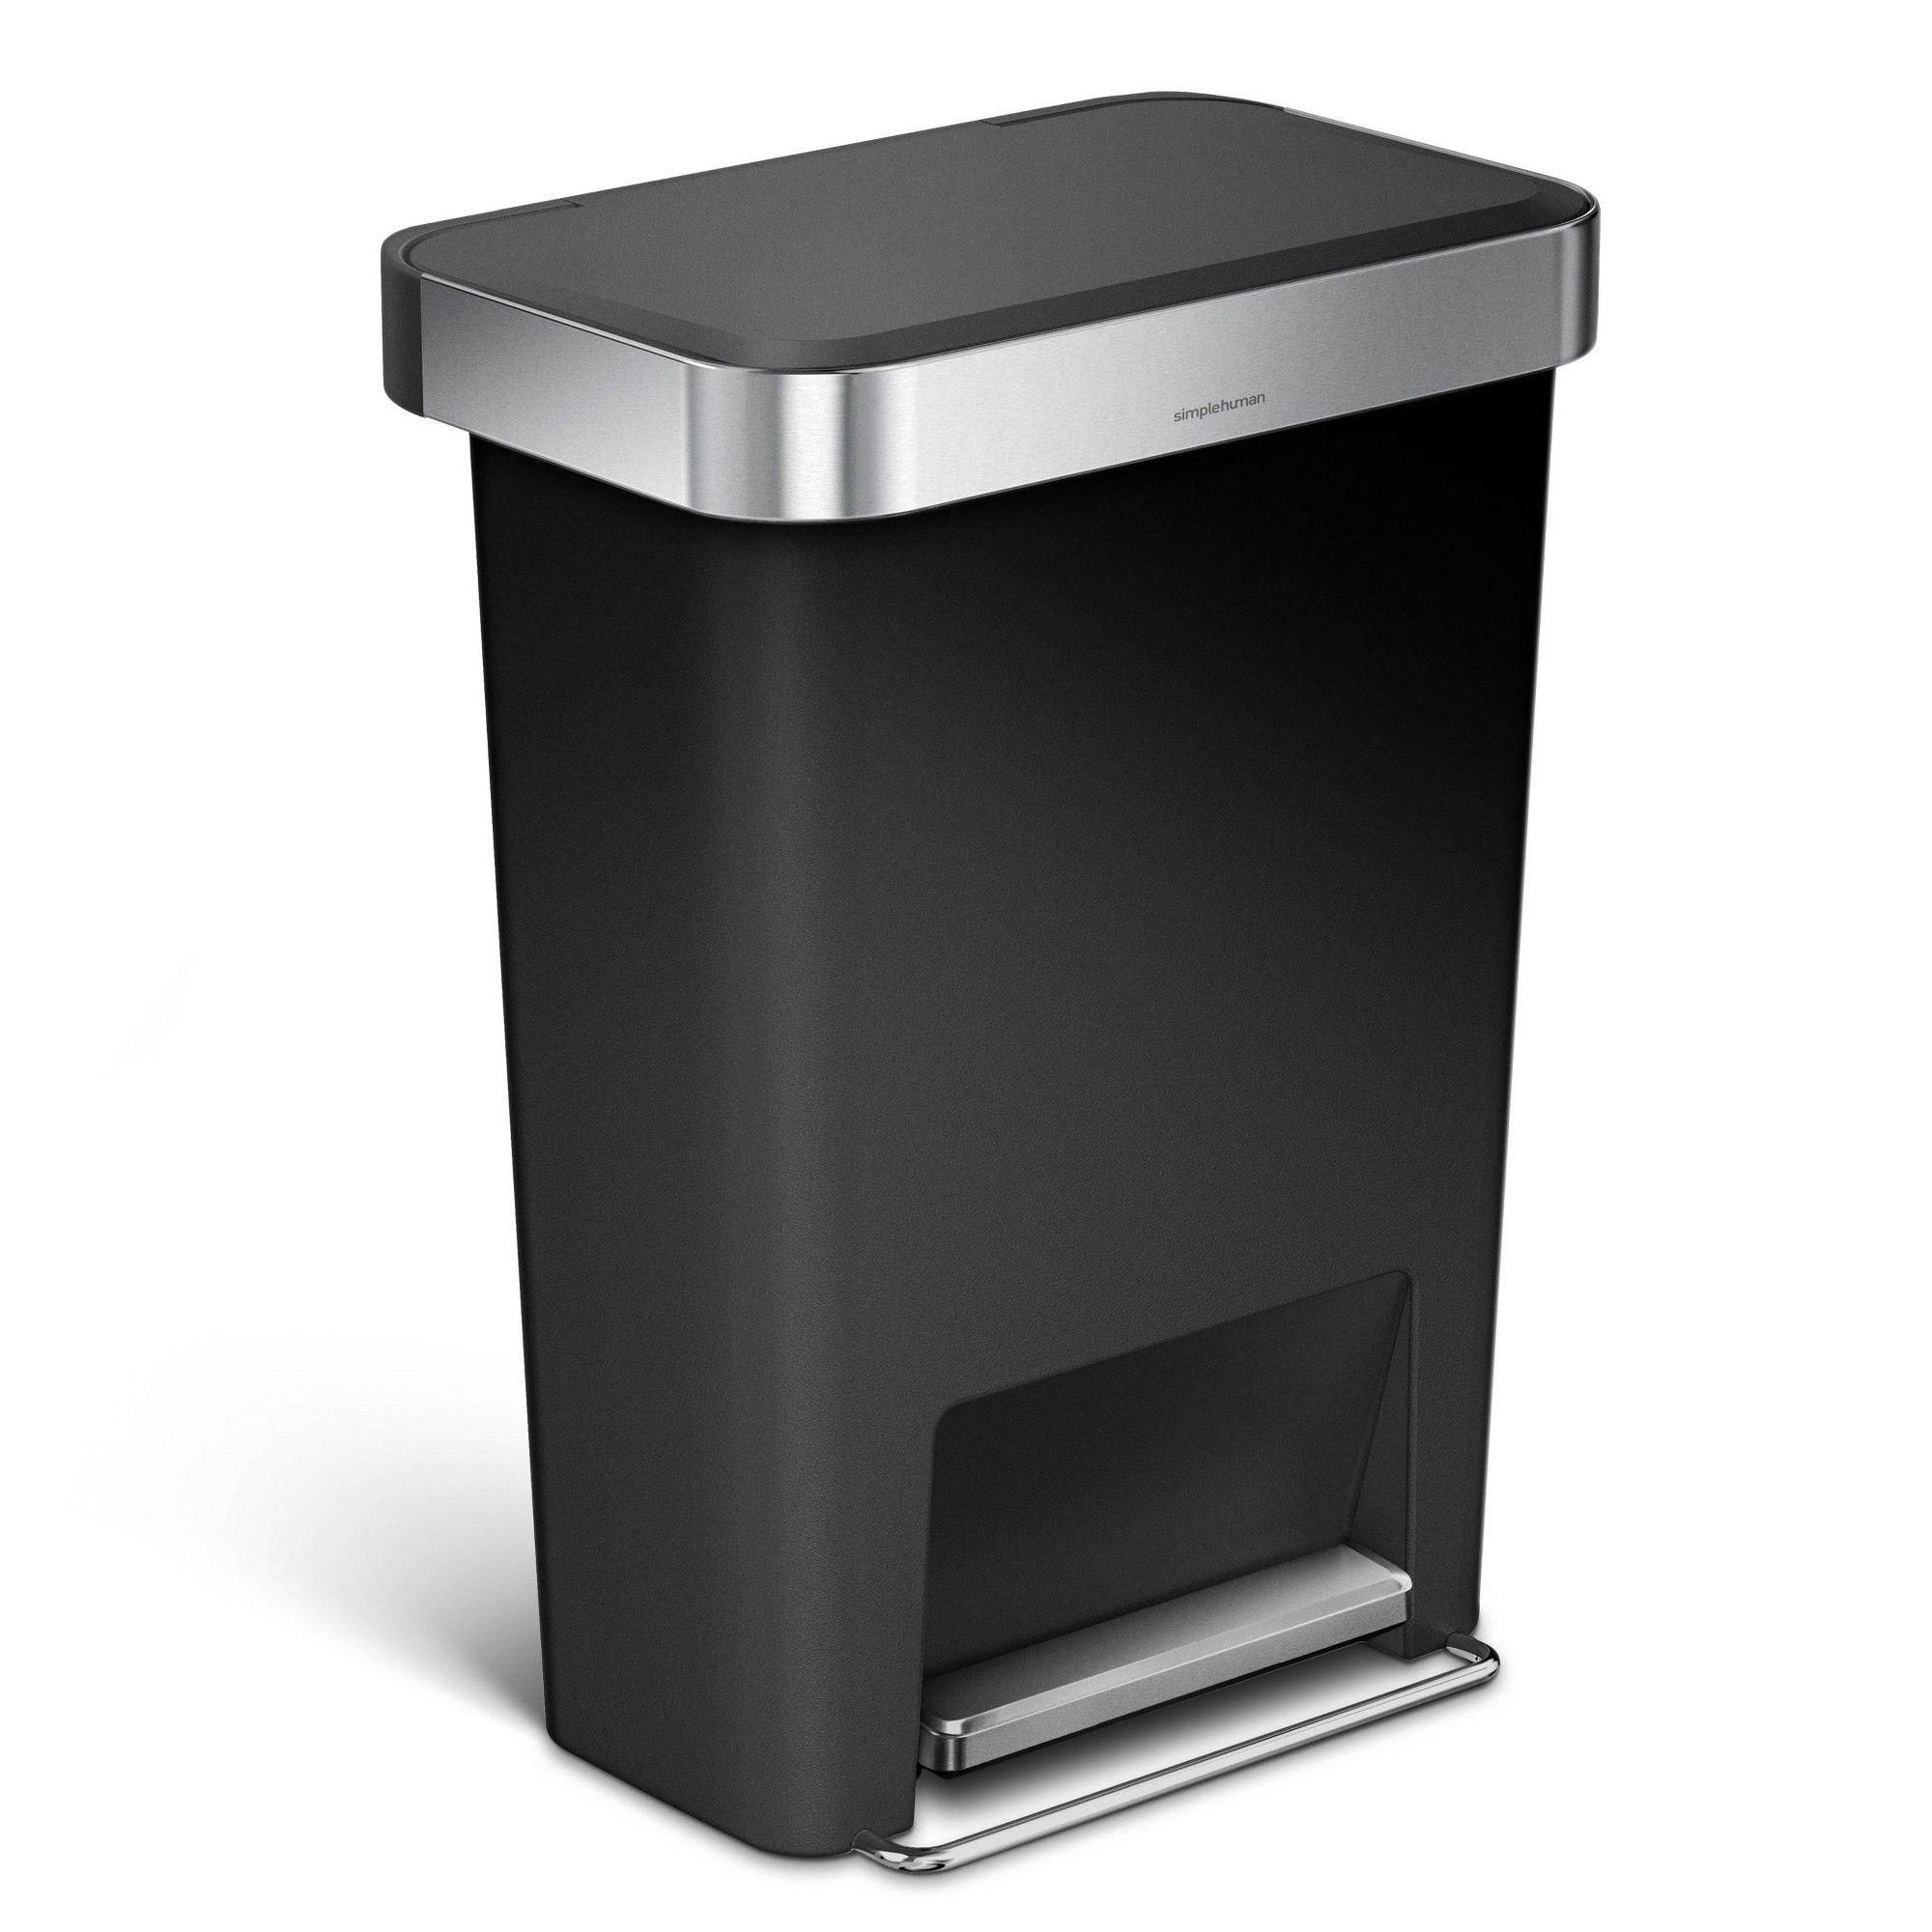 Simplehuman 45L Rectangular Trash Can Grey Step On Garbage Can Plastic Liner Rim